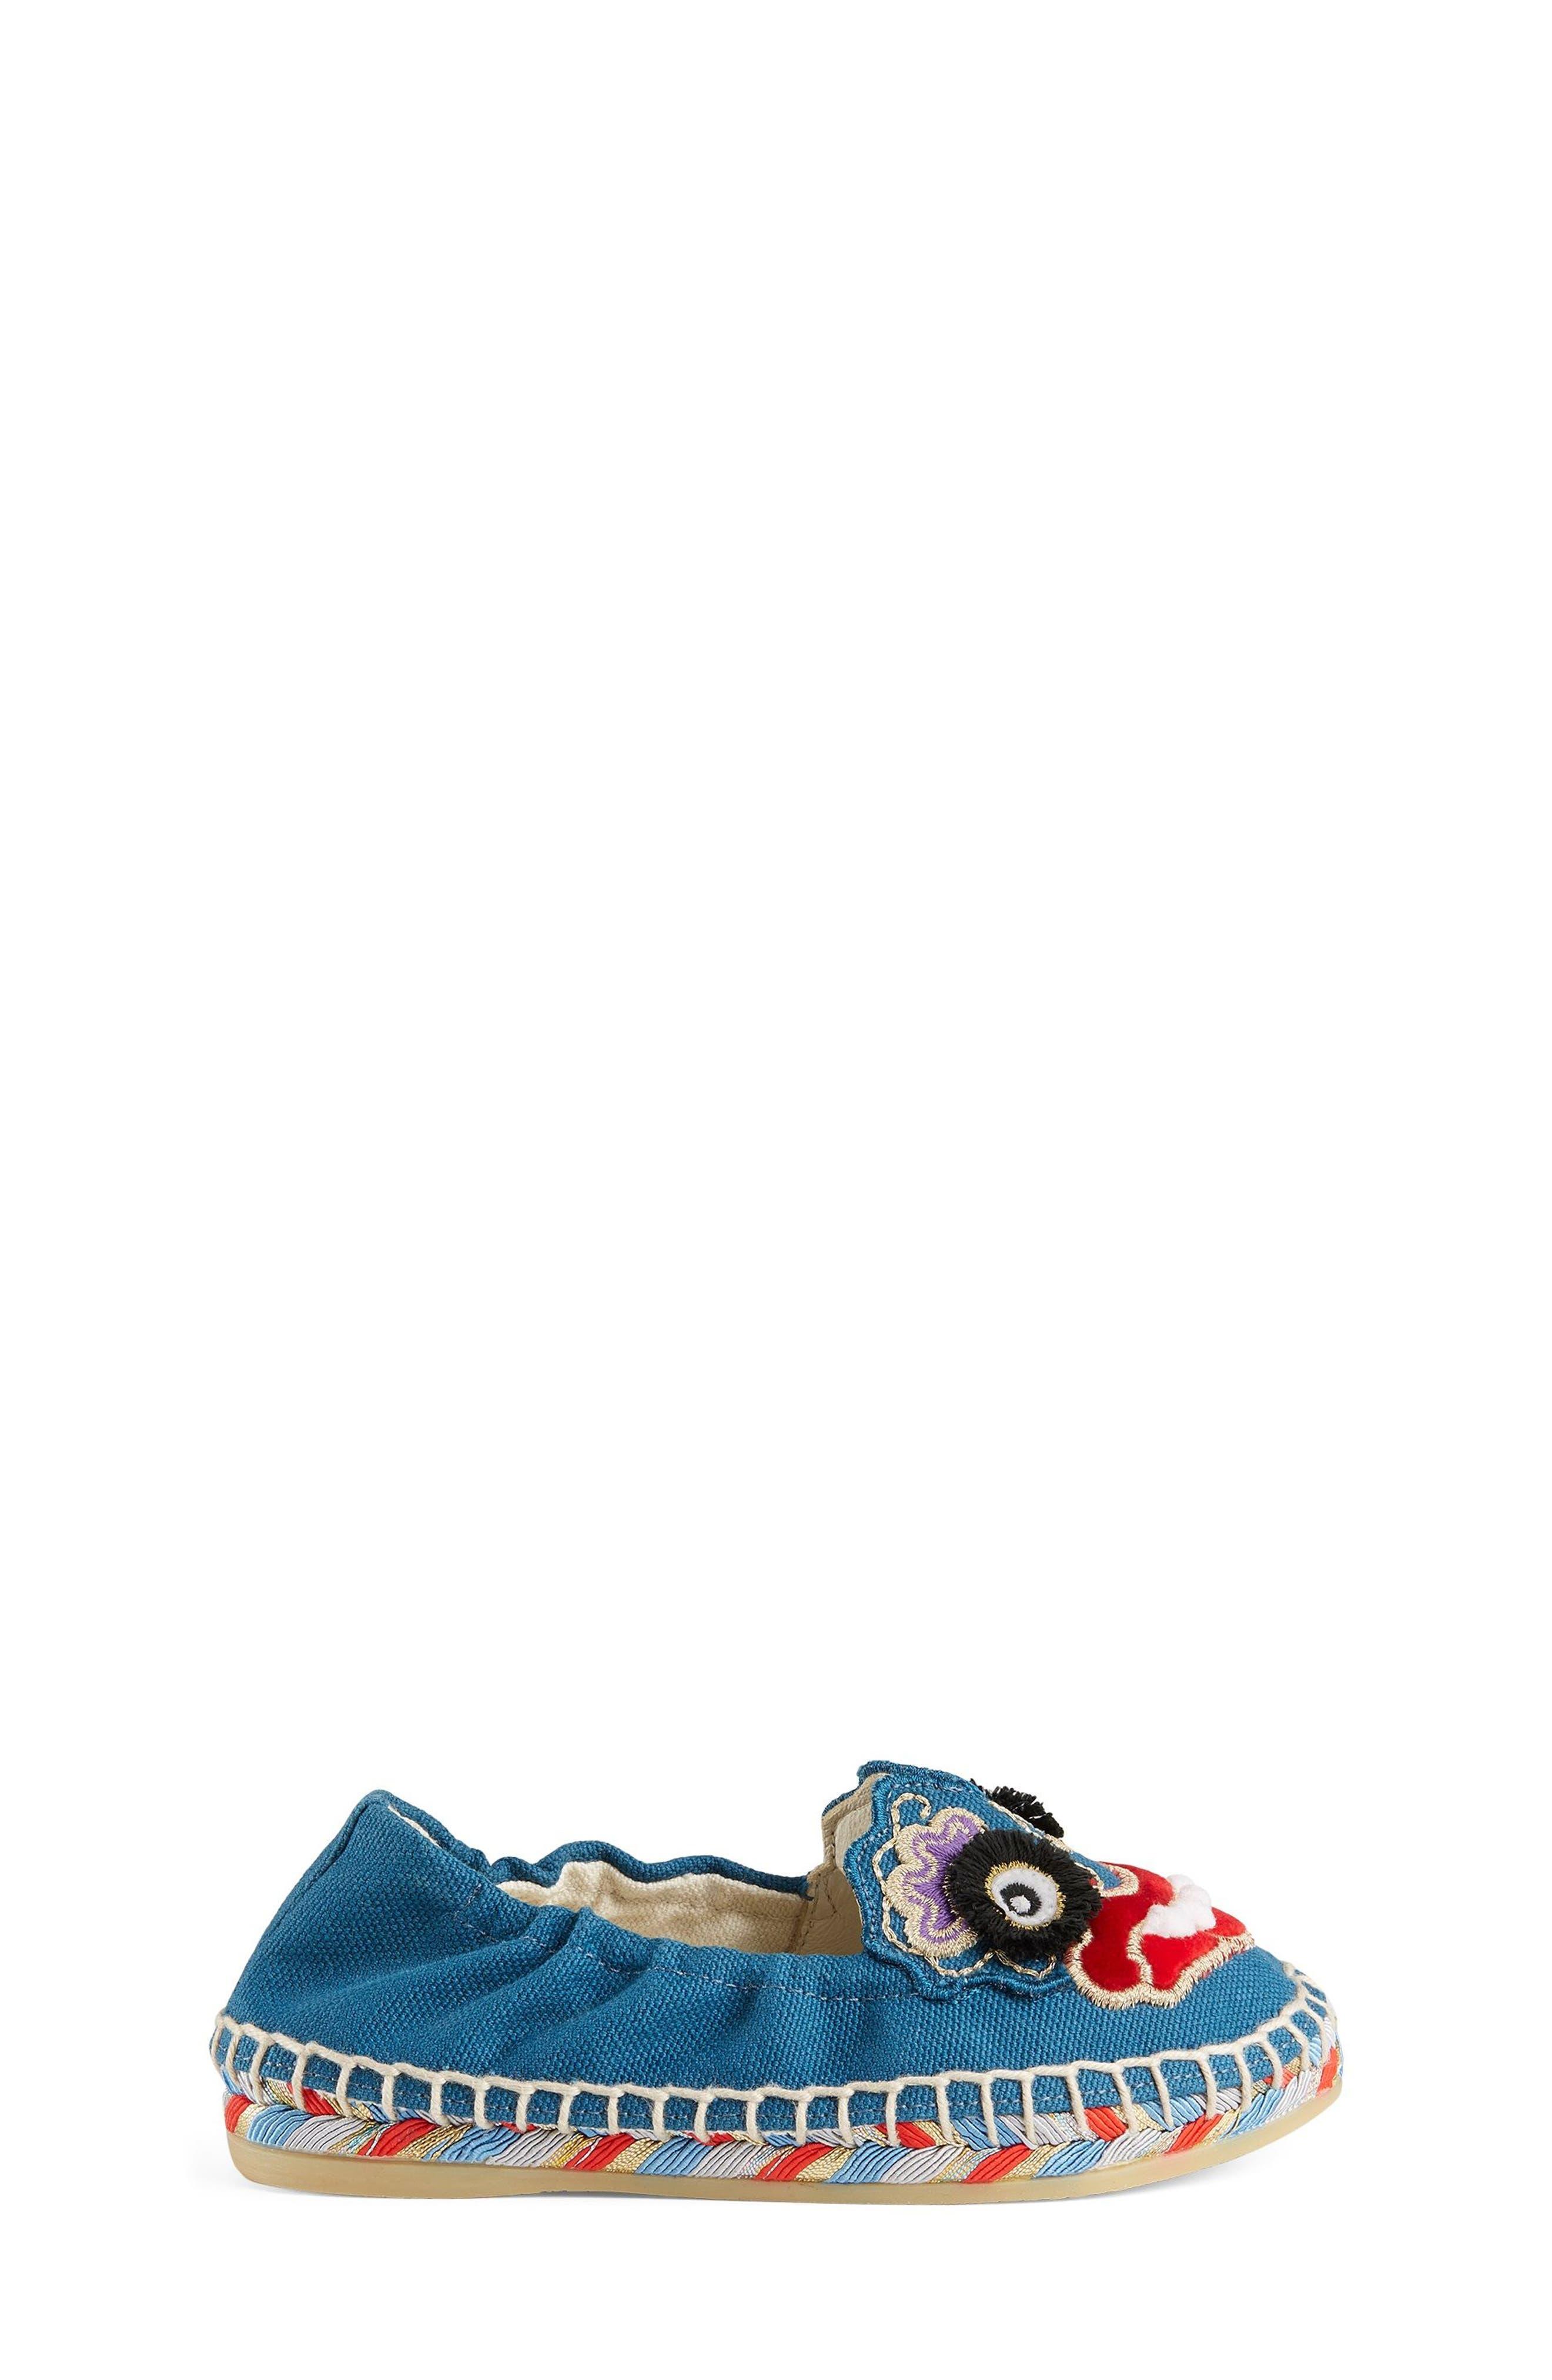 Wen Espadrille Flat,                             Alternate thumbnail 2, color,                             494